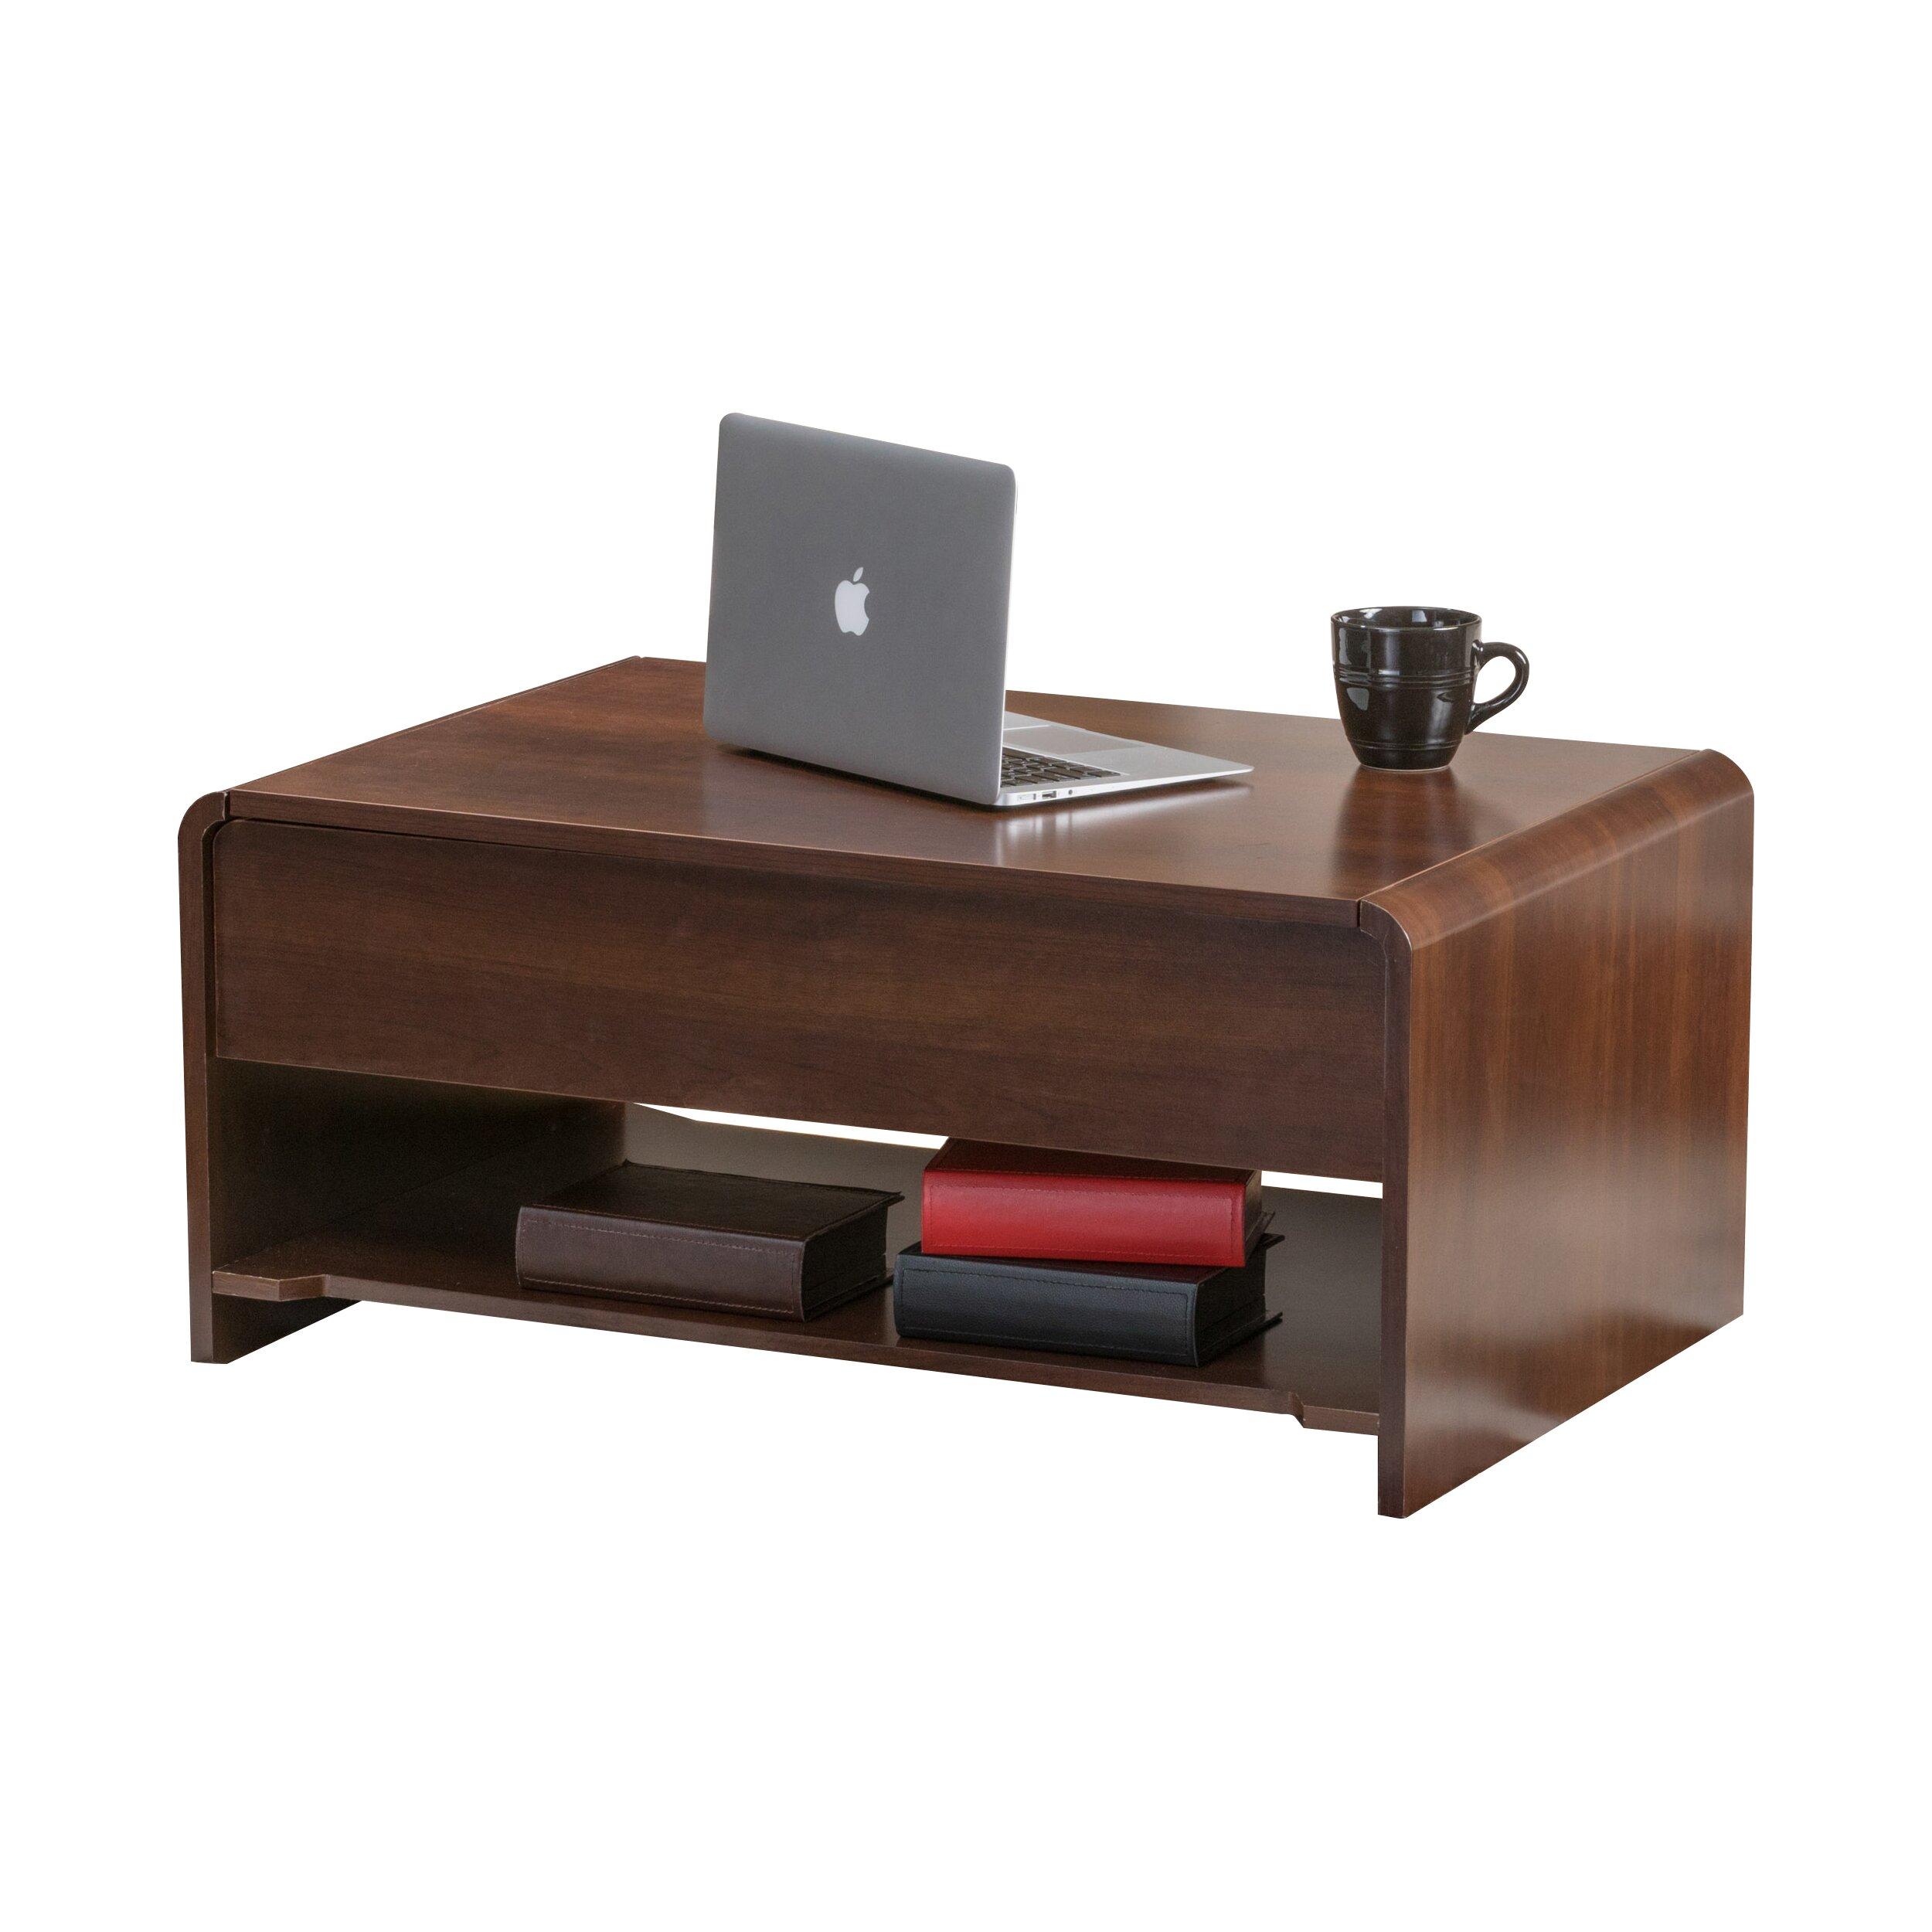 Latitude run lift top storage coffee table reviews wayfair for Wayfair coffee tables with storage